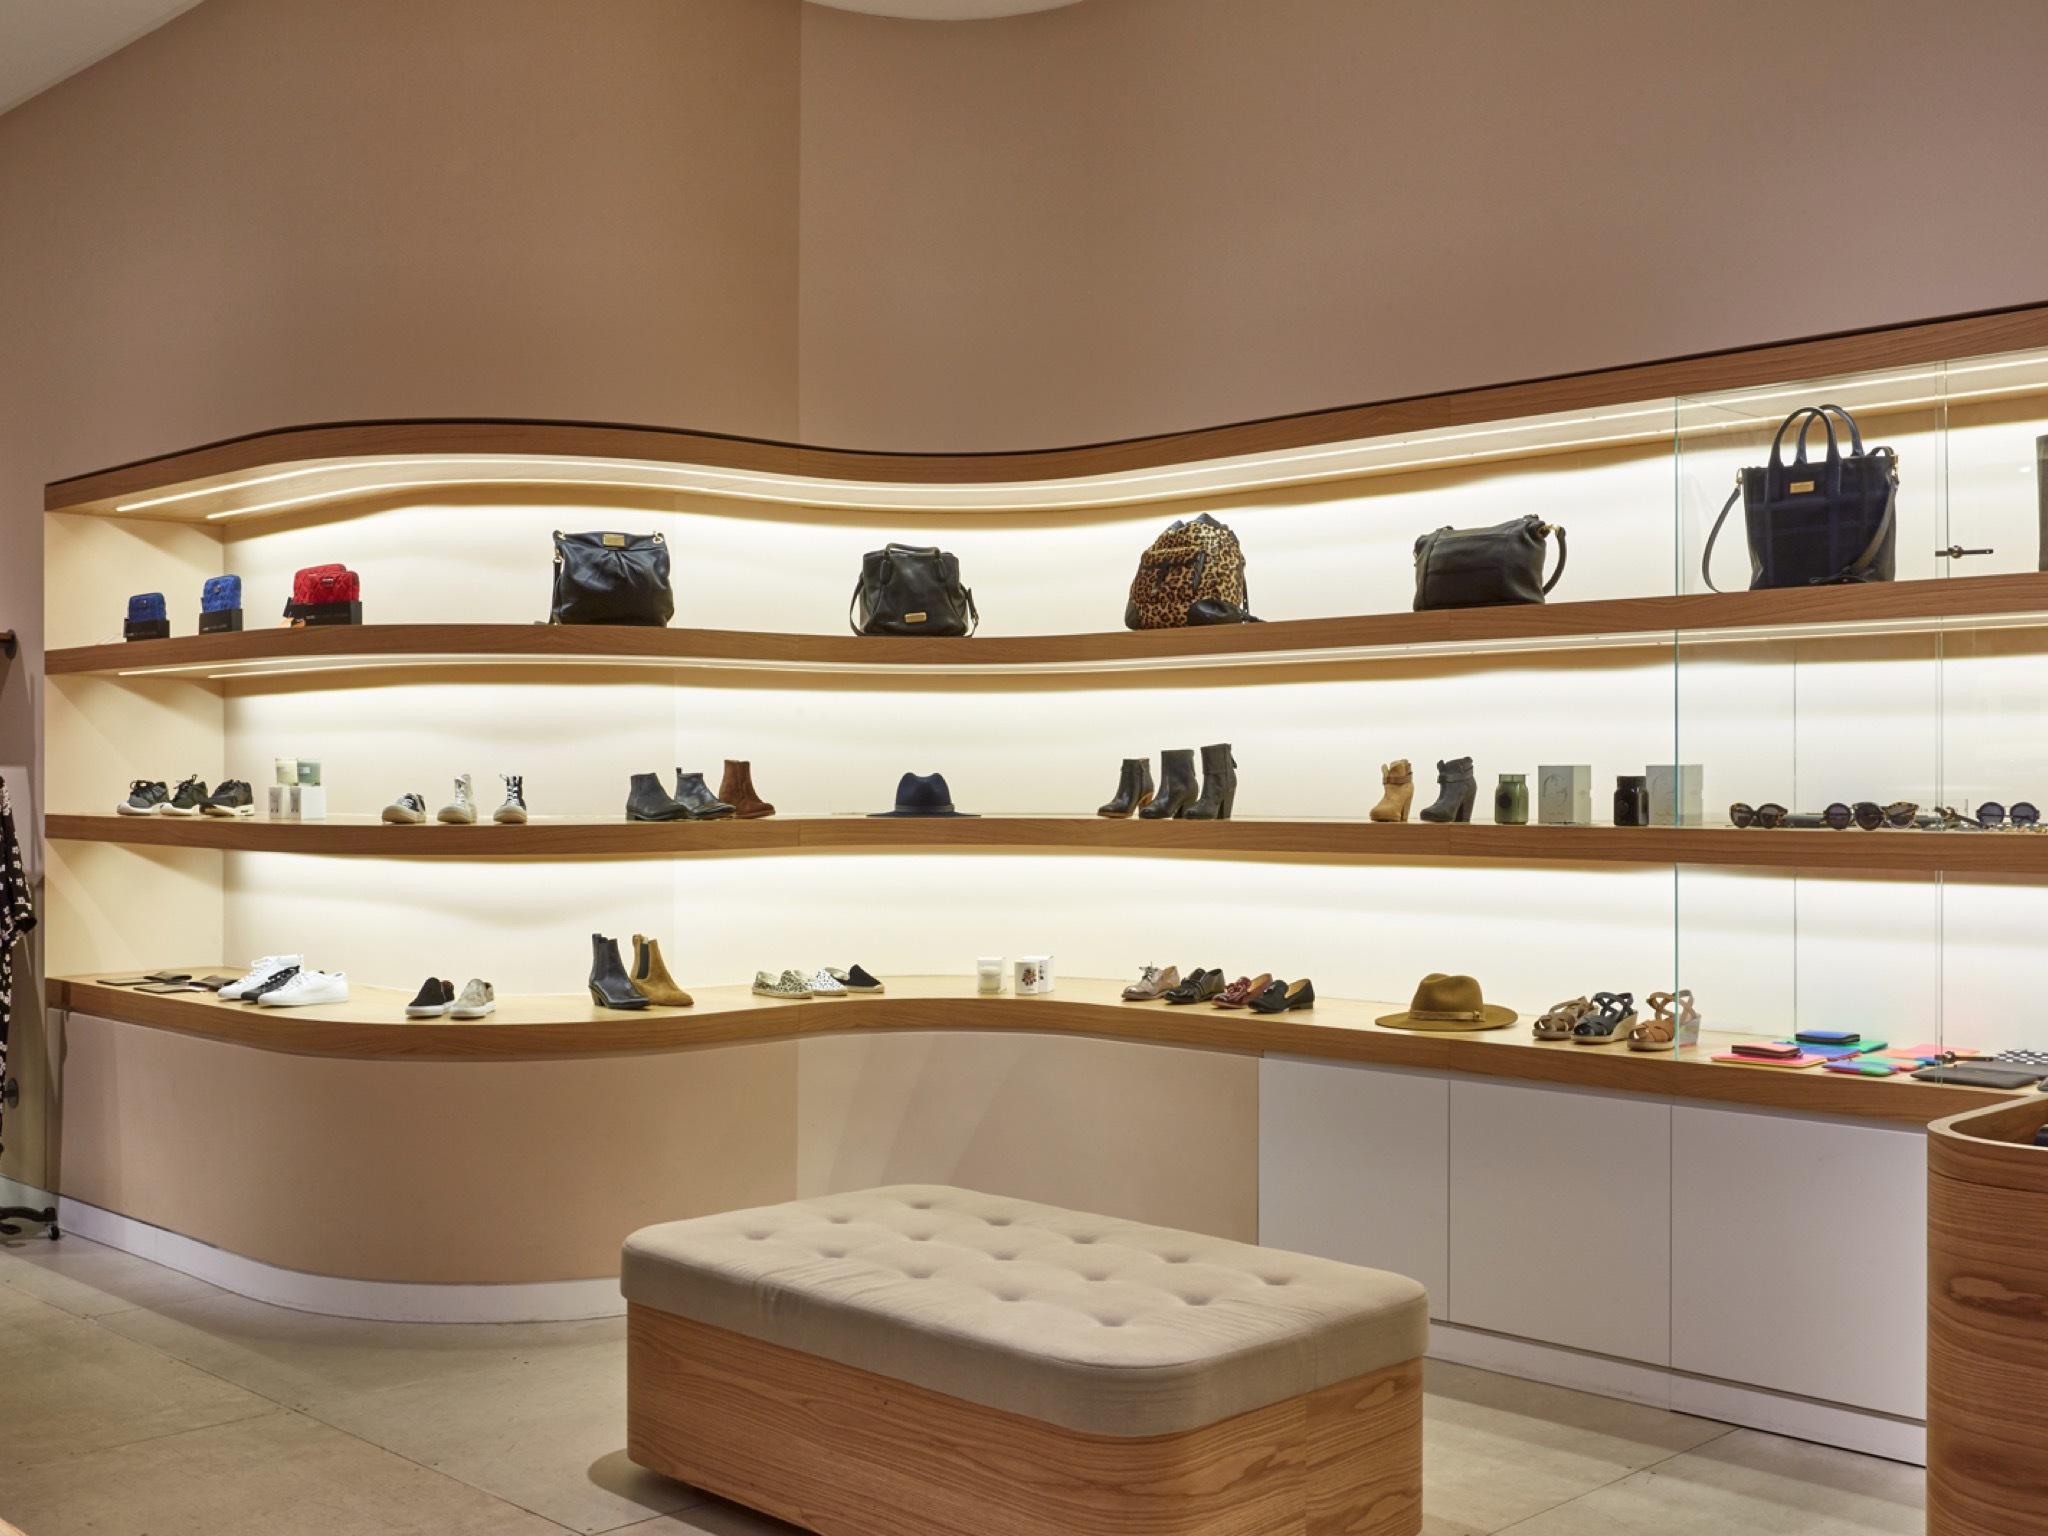 Incu Stores at The Galeries CBD